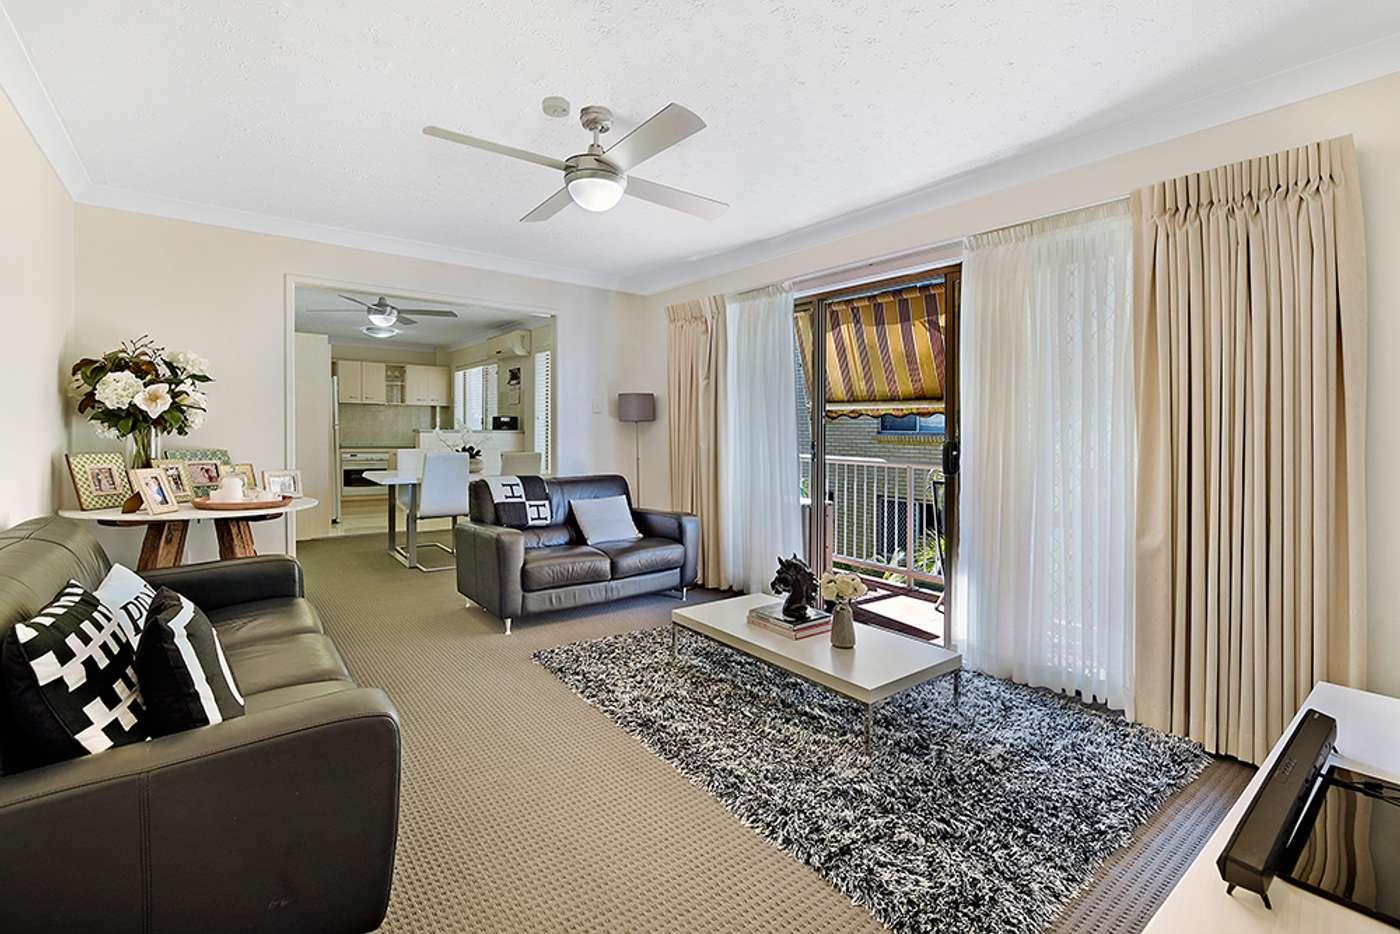 Main view of Homely unit listing, 4/11 Armrick Avenue, Broadbeach QLD 4218